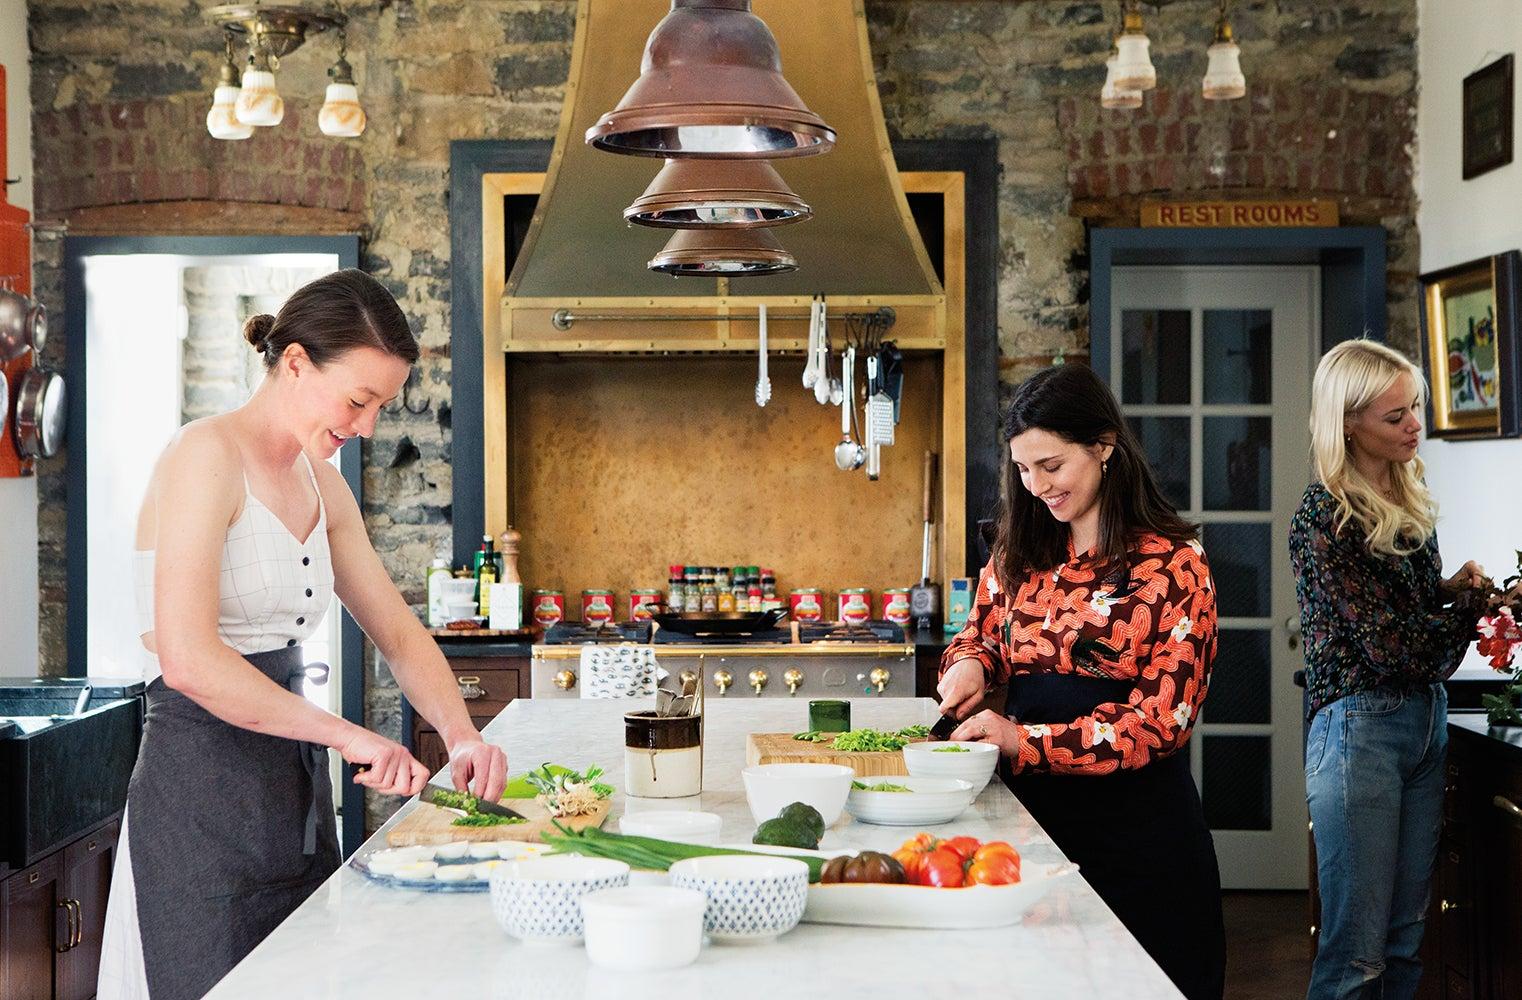 women prepping food in kitchen